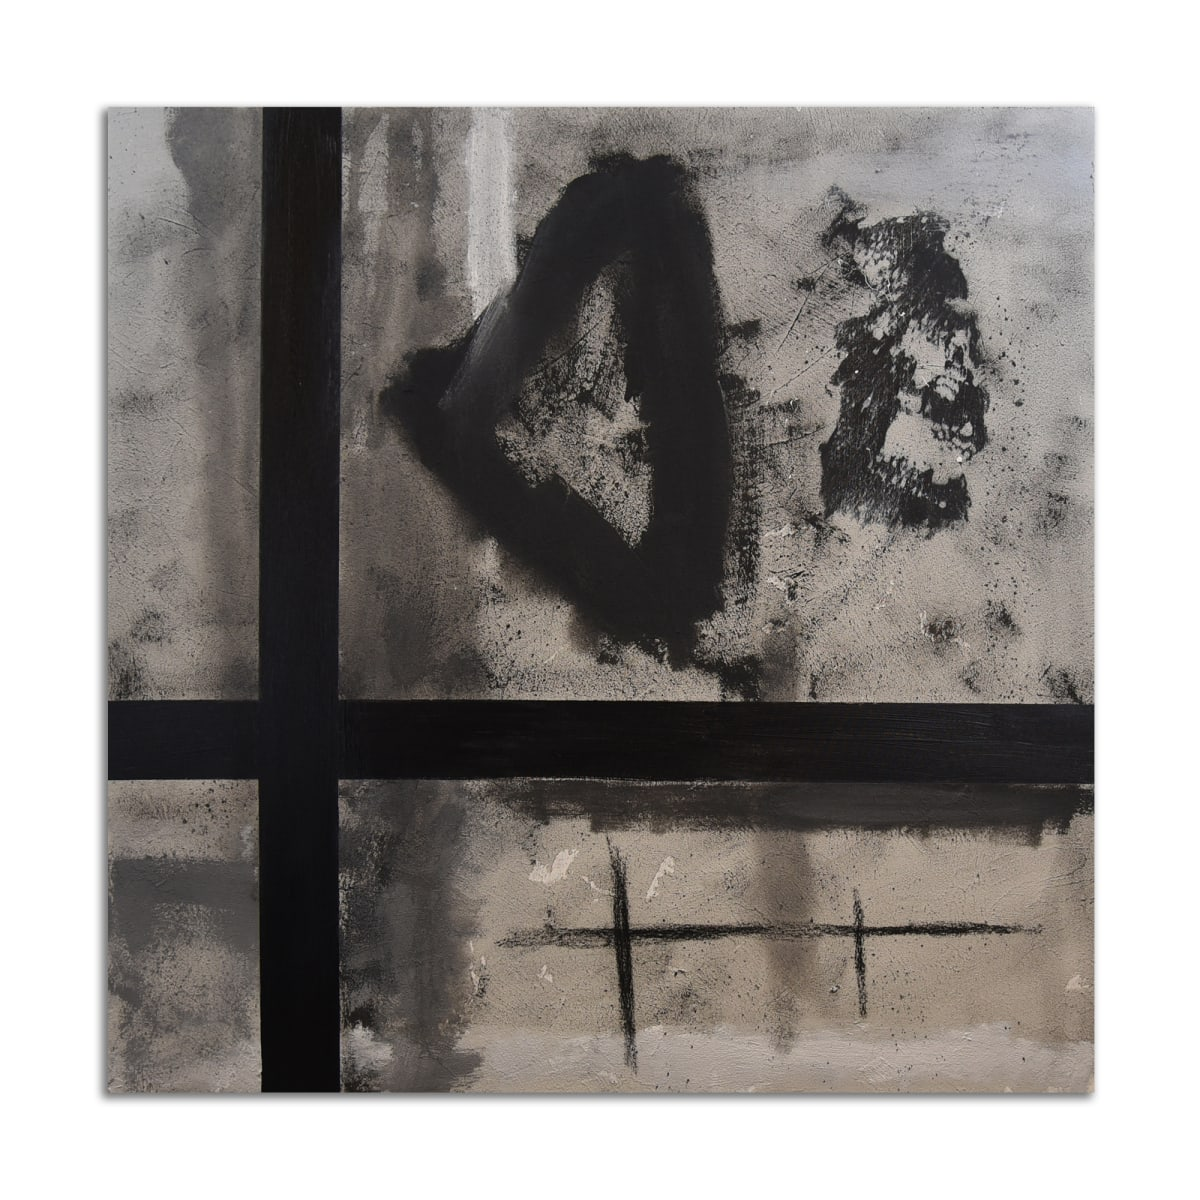 Anomoly by J. Kent Martin